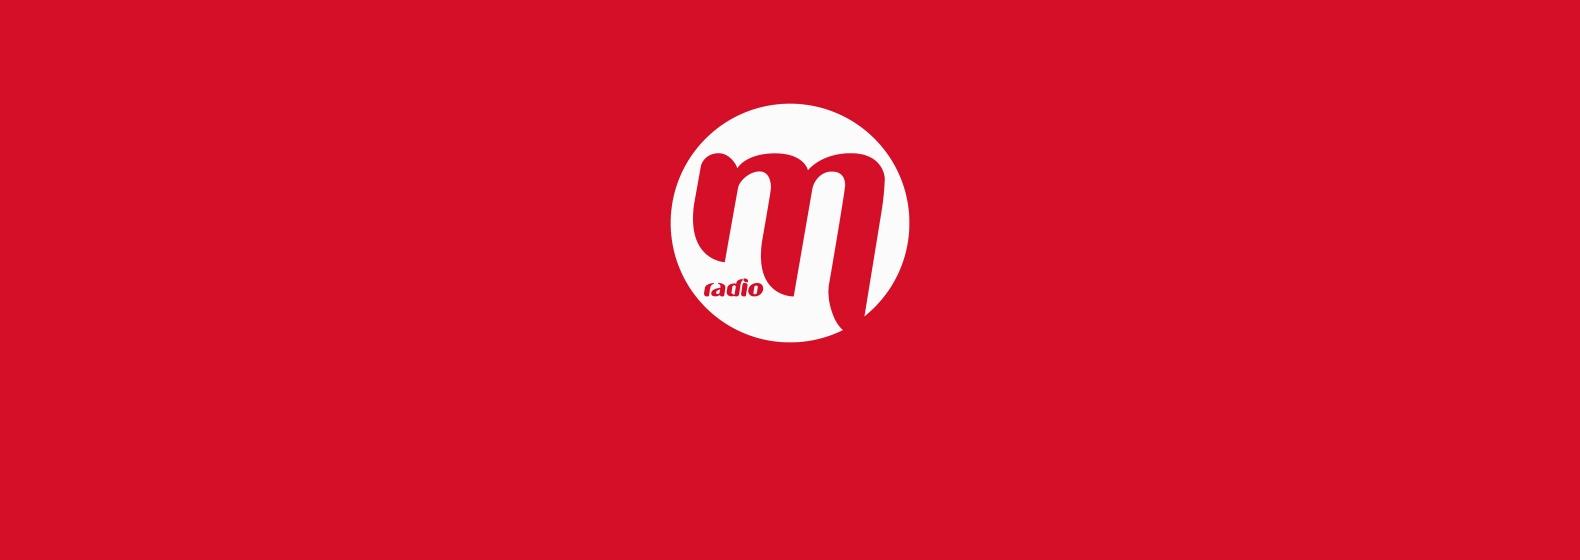 m-radio.jpg